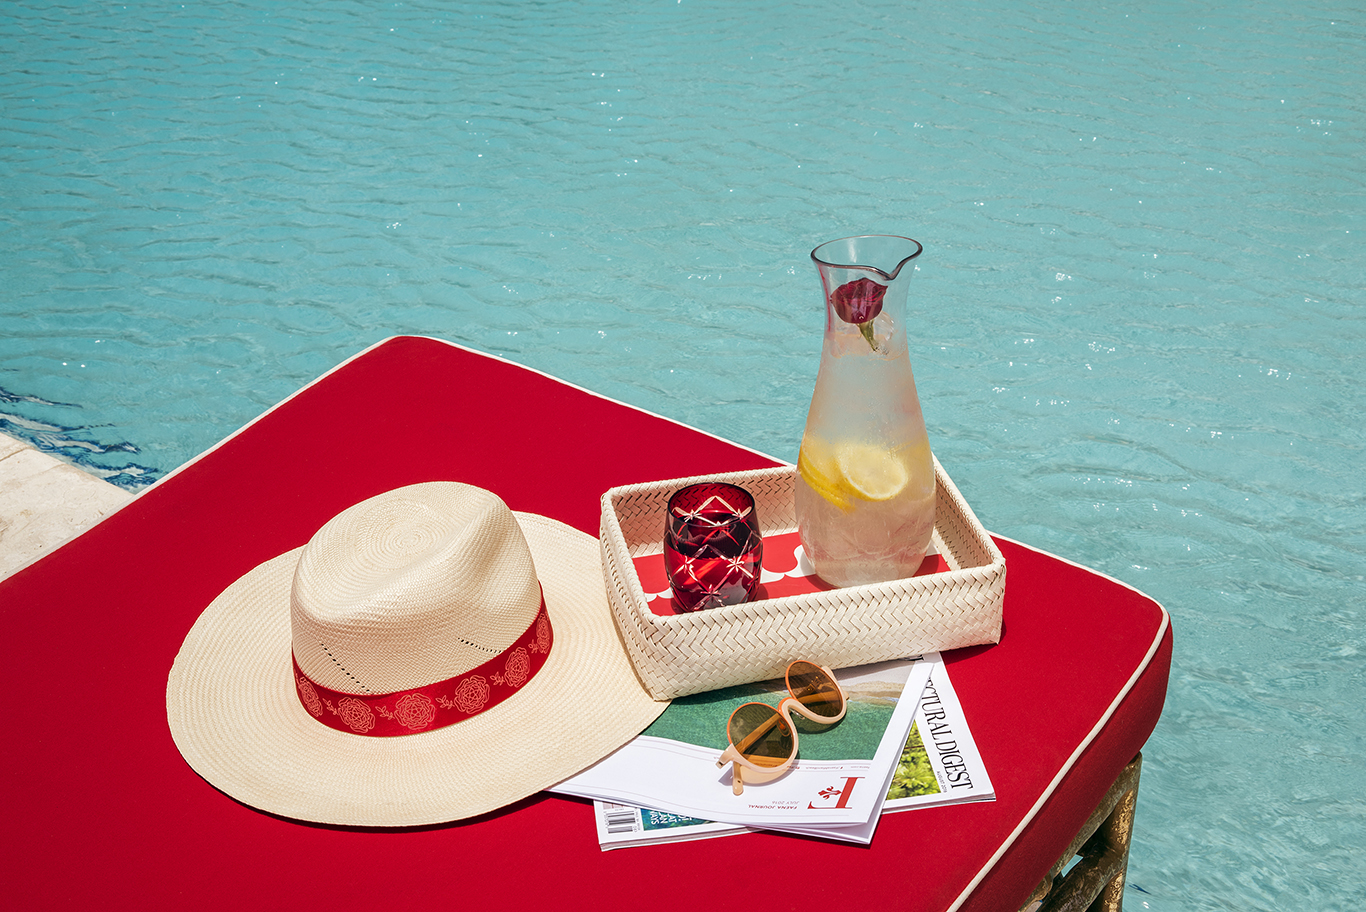 Faena Pool_ Iced Water and Faena Hat_Photo by Juan Fernando Ayora.jpg